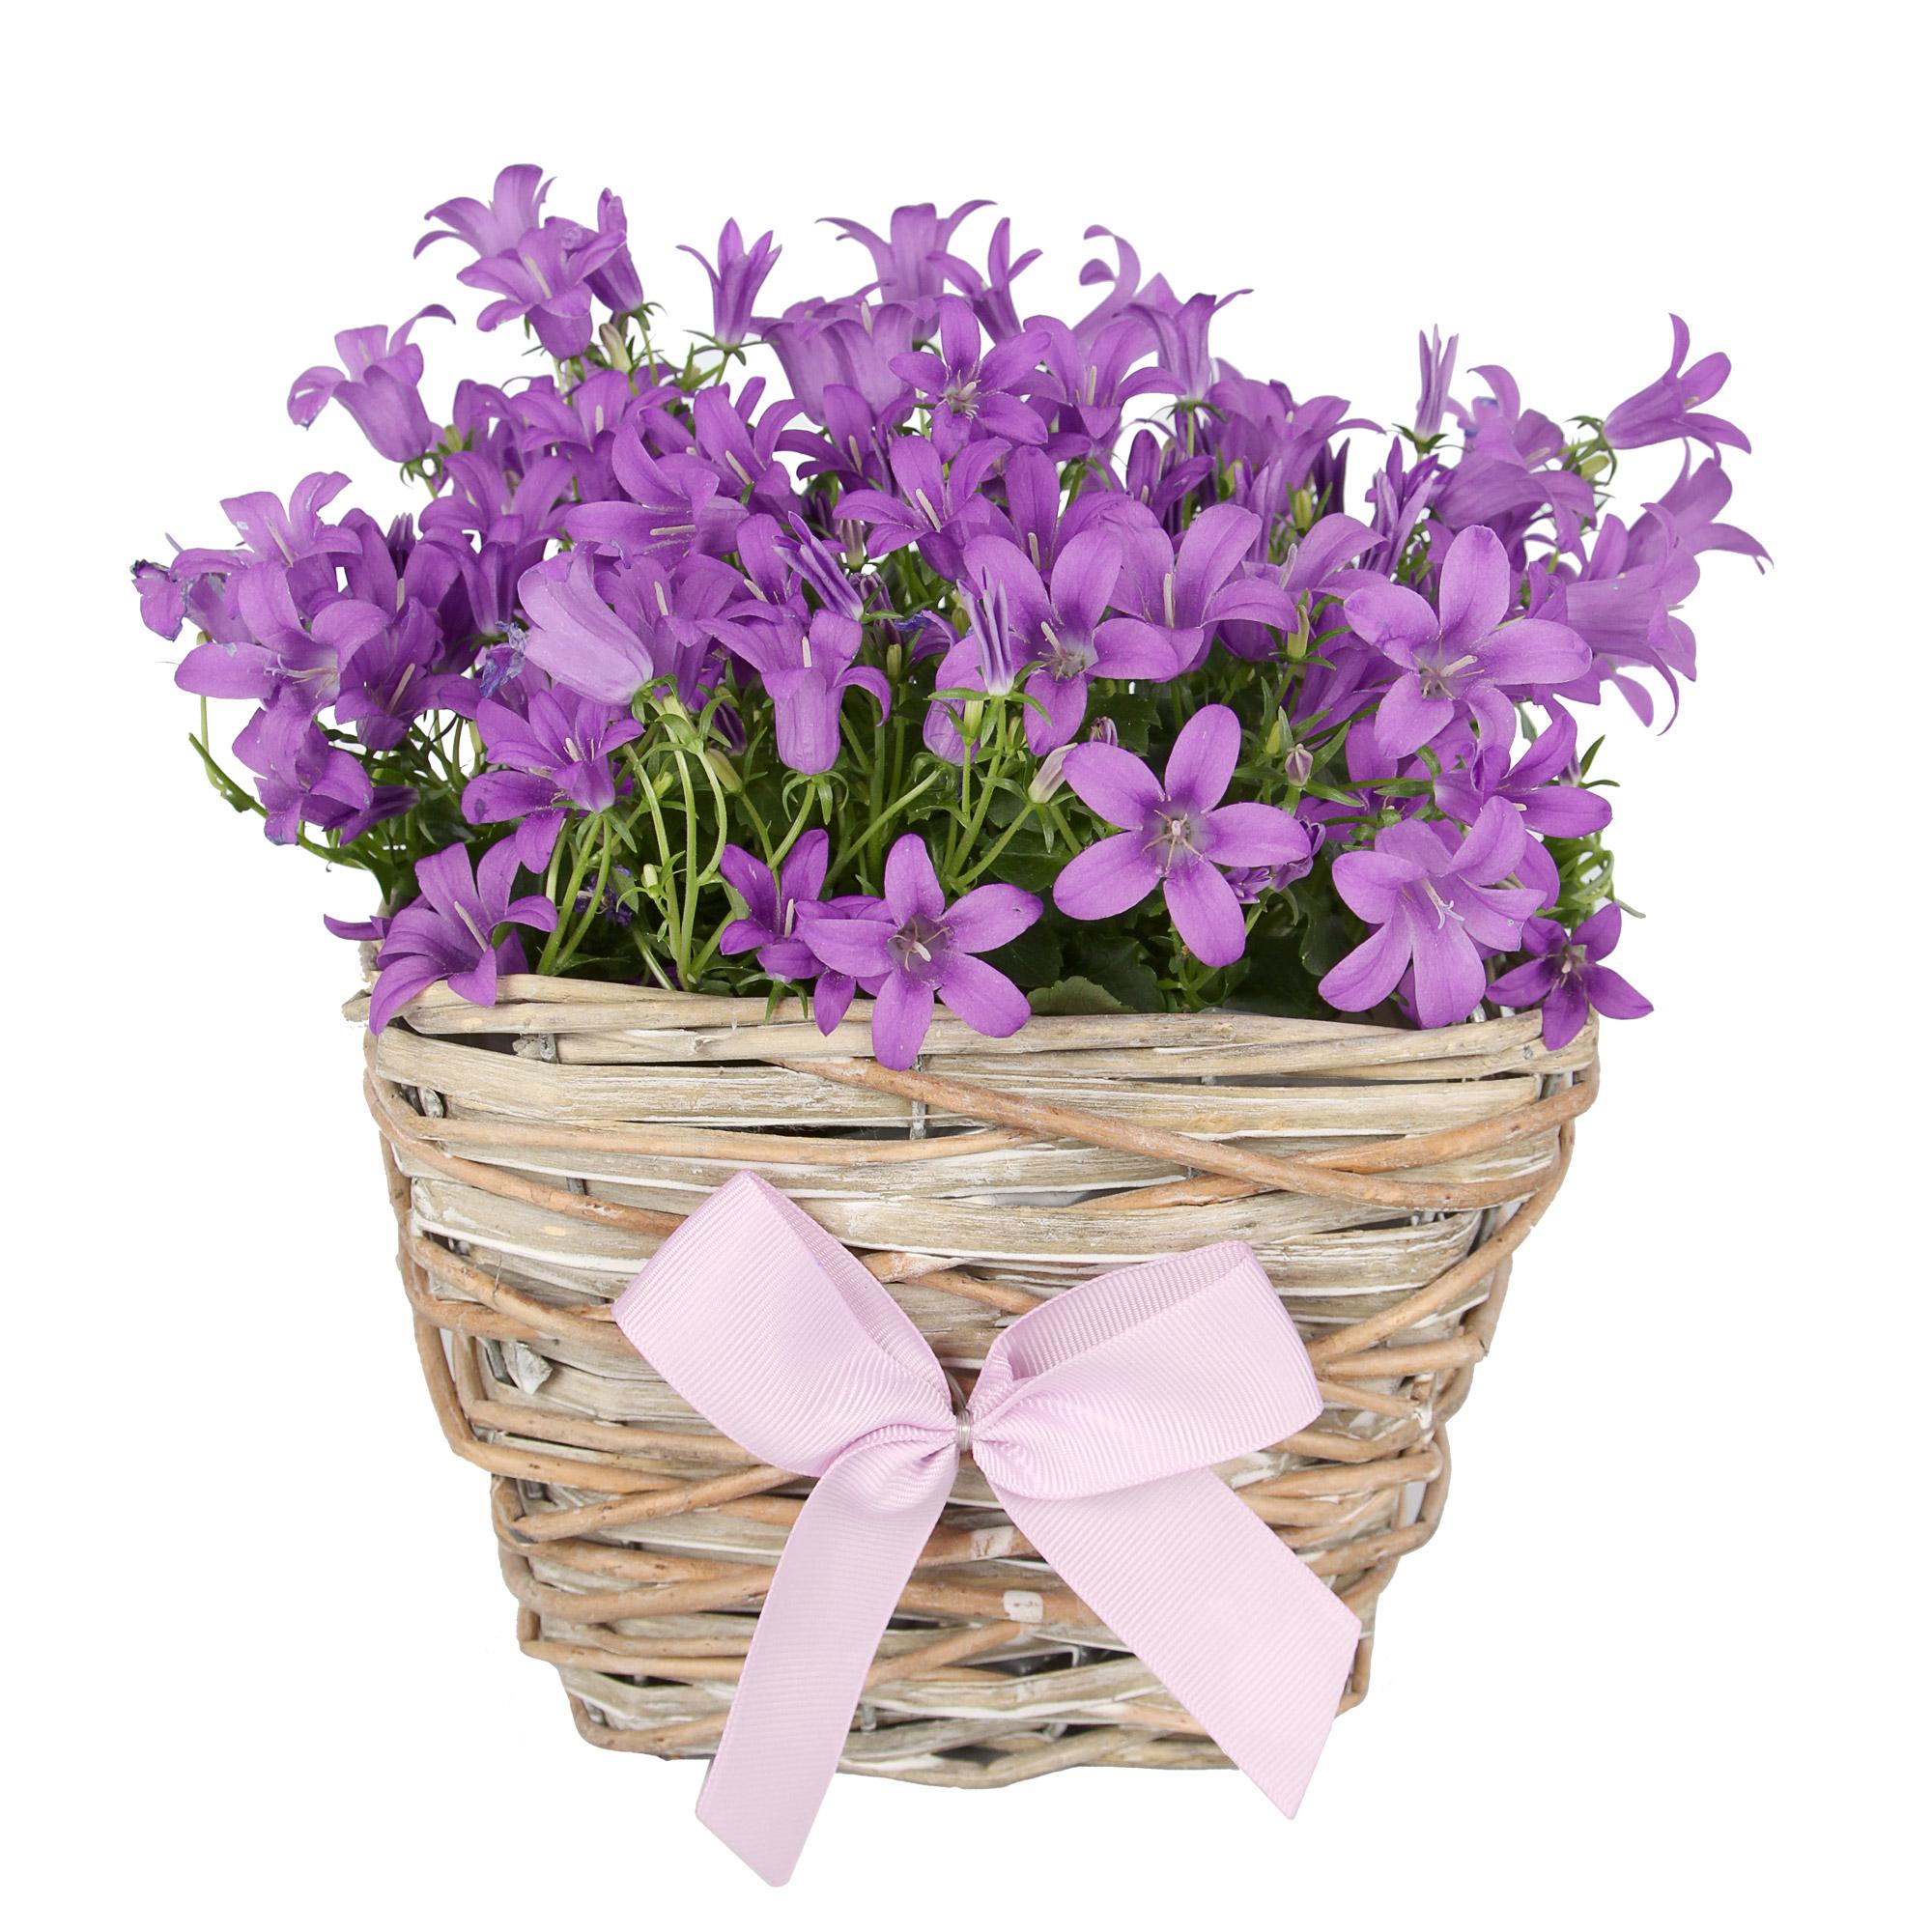 Plant Gift Ideas